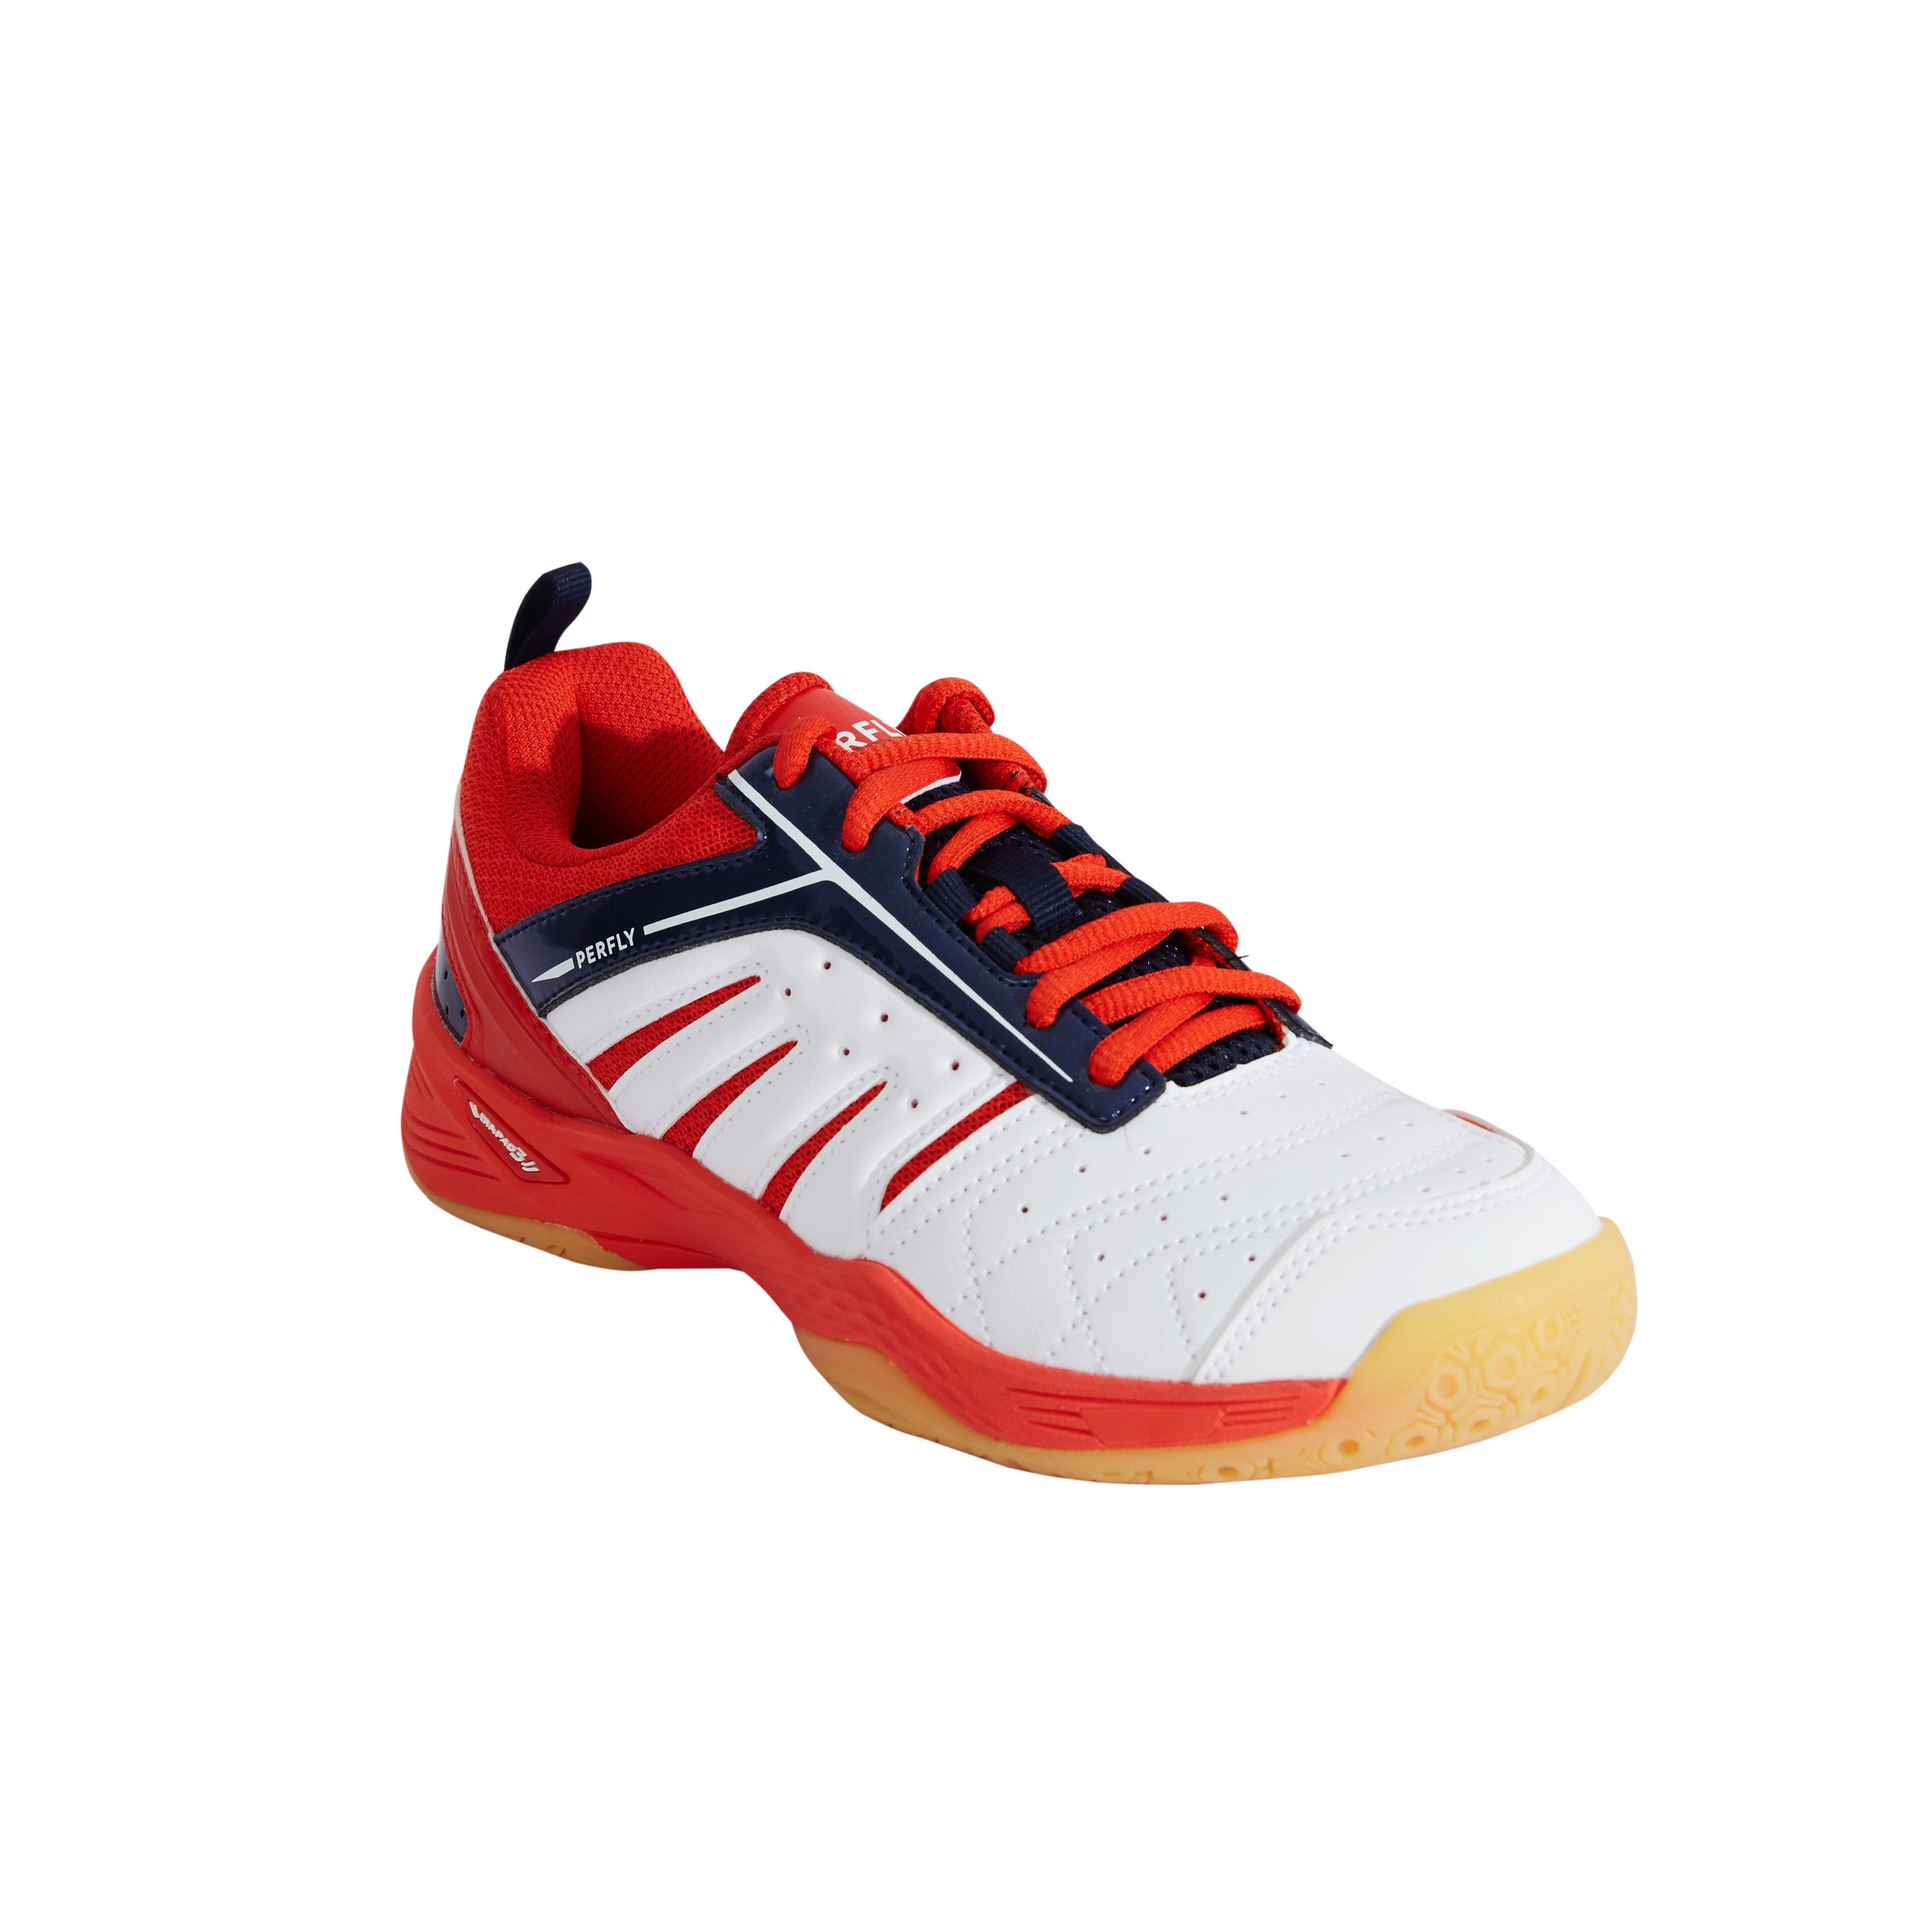 Perfly Chaussures De Badminton Junior BS 560 Lite - Blanc/Rouge - Perfly